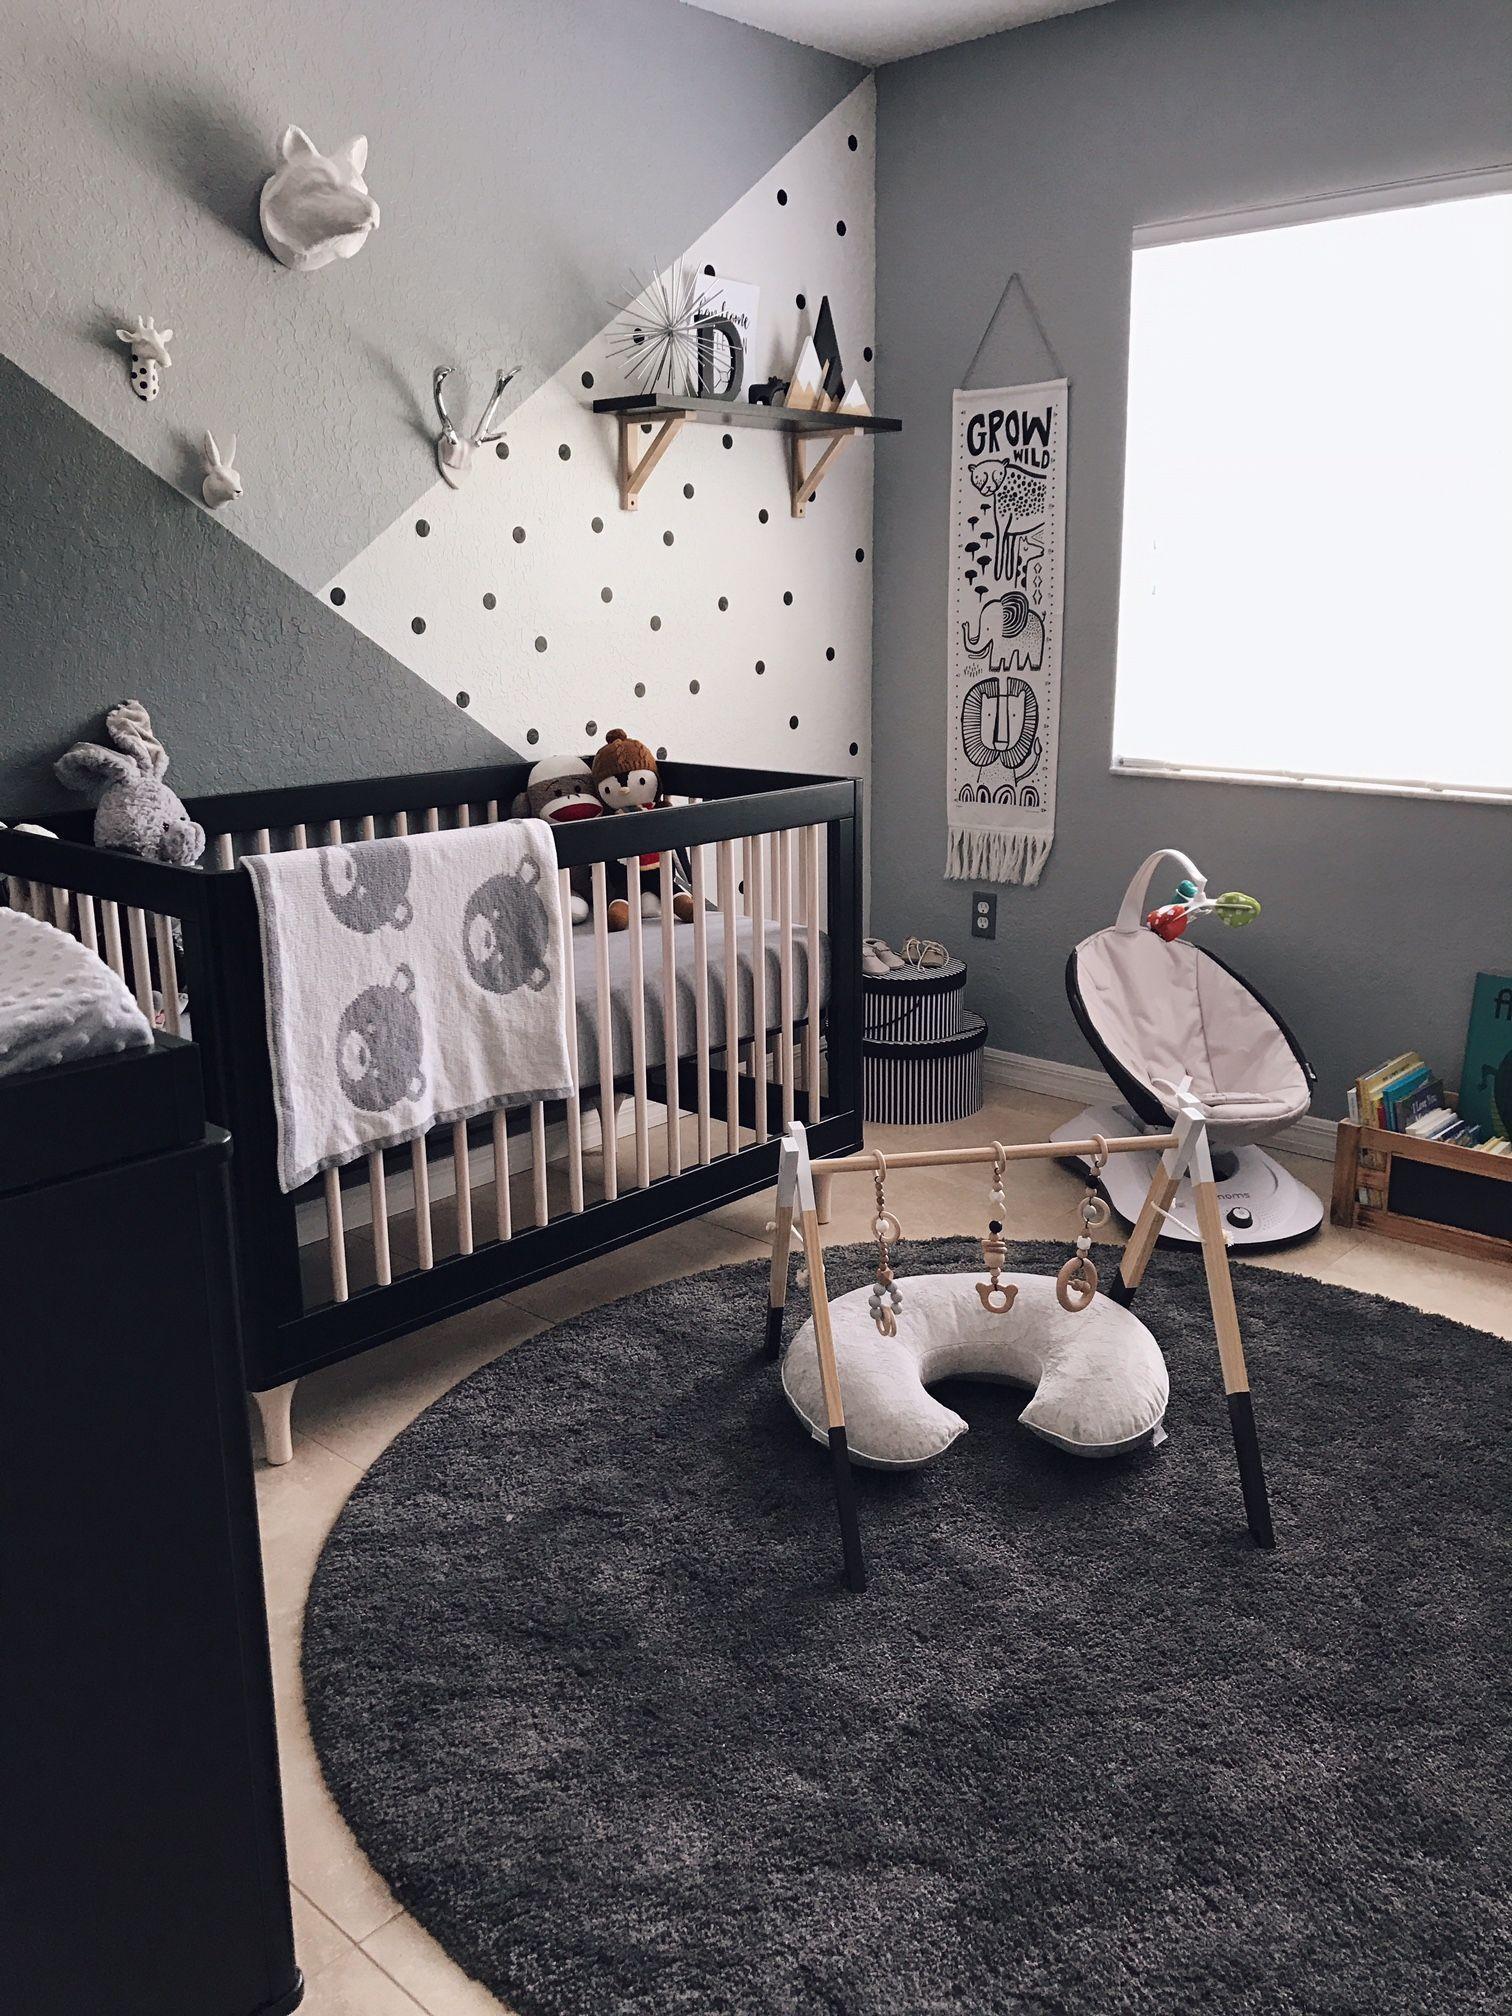 20 Creative Baby Room Themes Decoratop Nursery Baby Room Baby